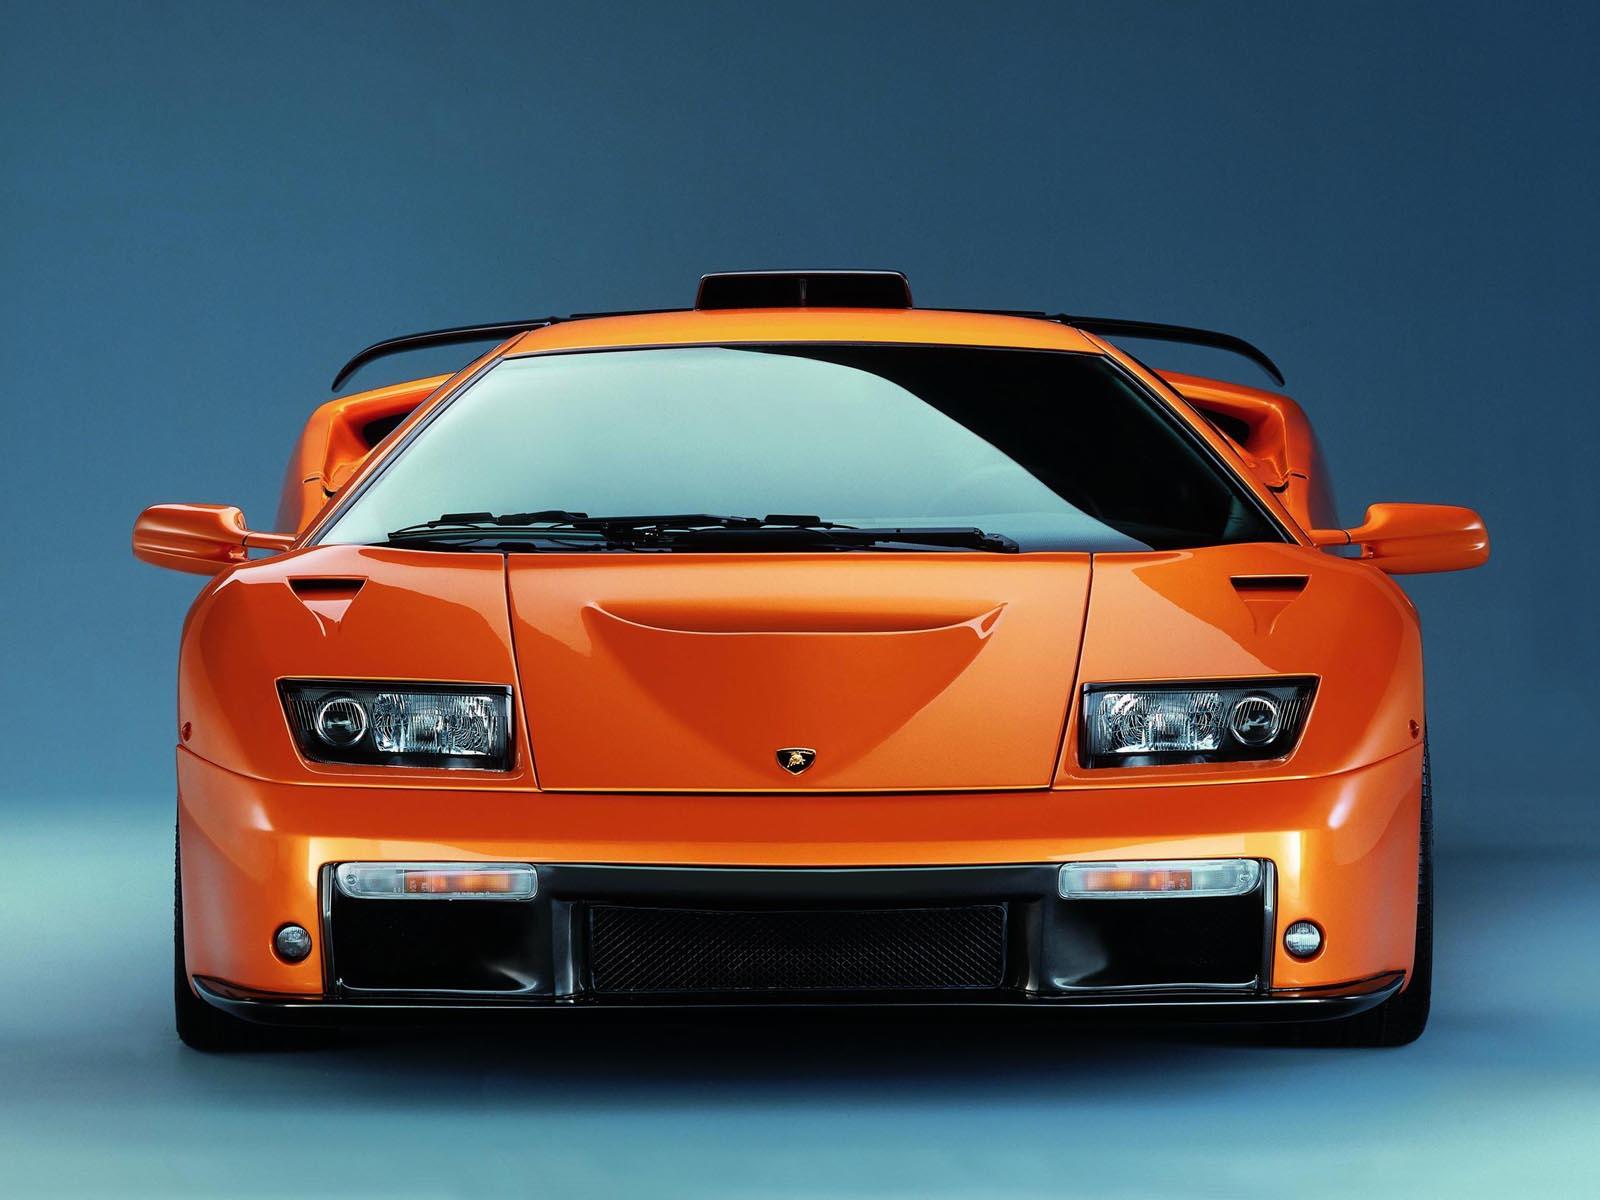 http://4.bp.blogspot.com/-t2wcQWXvb8I/Tx6Q7NsEhlI/AAAAAAAAAfk/98QSKEiUP9o/s1600/Lamborghini-Diablo-wallpapers+%25284%2529.jpg